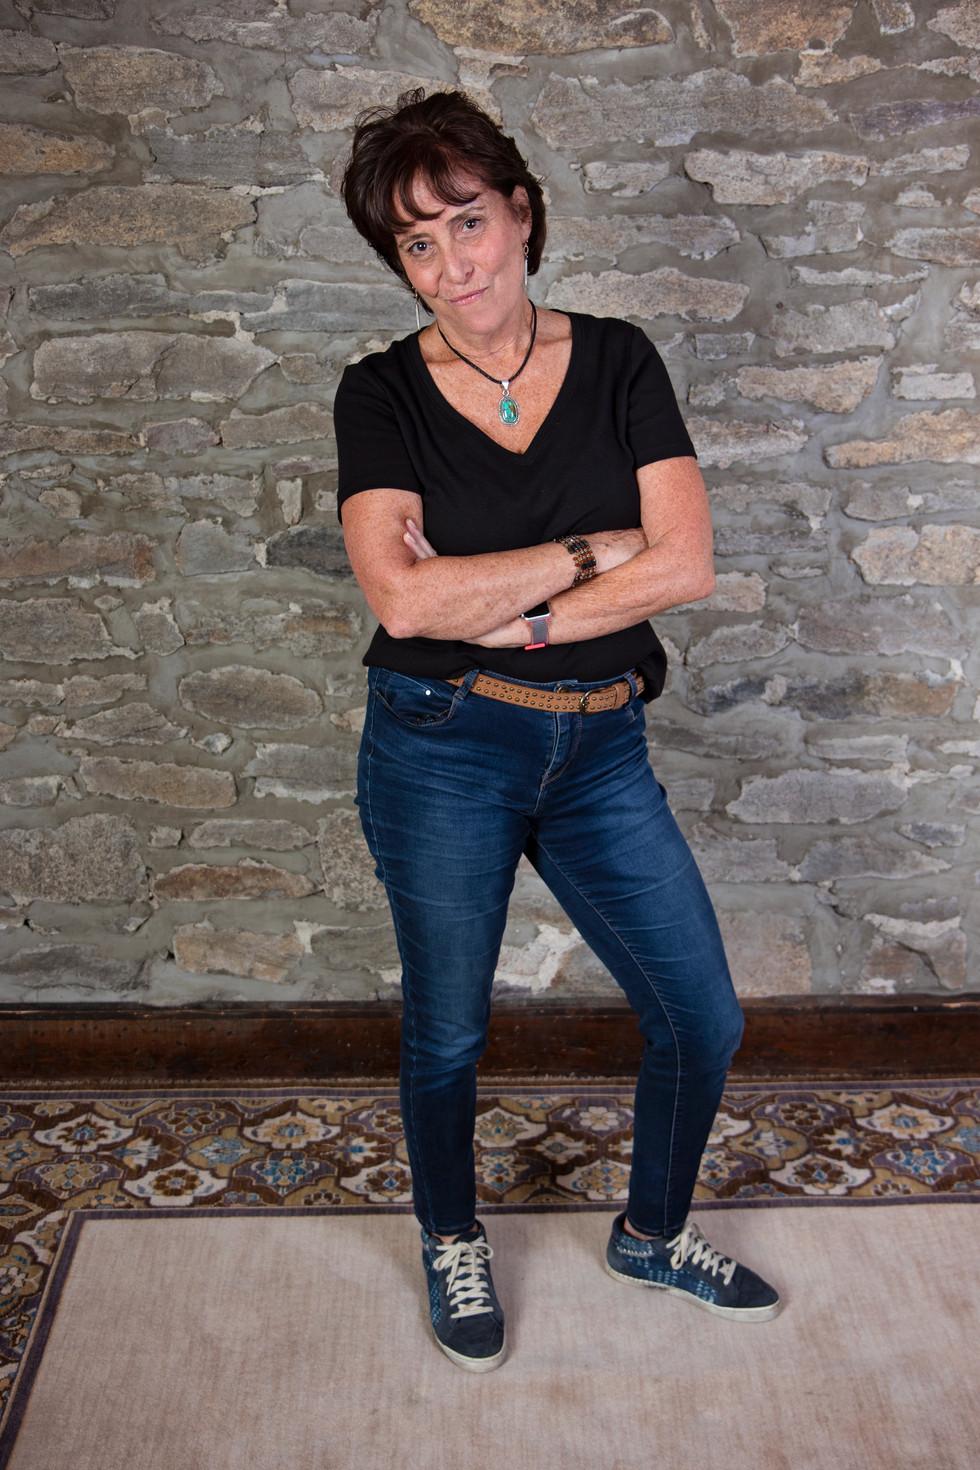 Tina Lipson